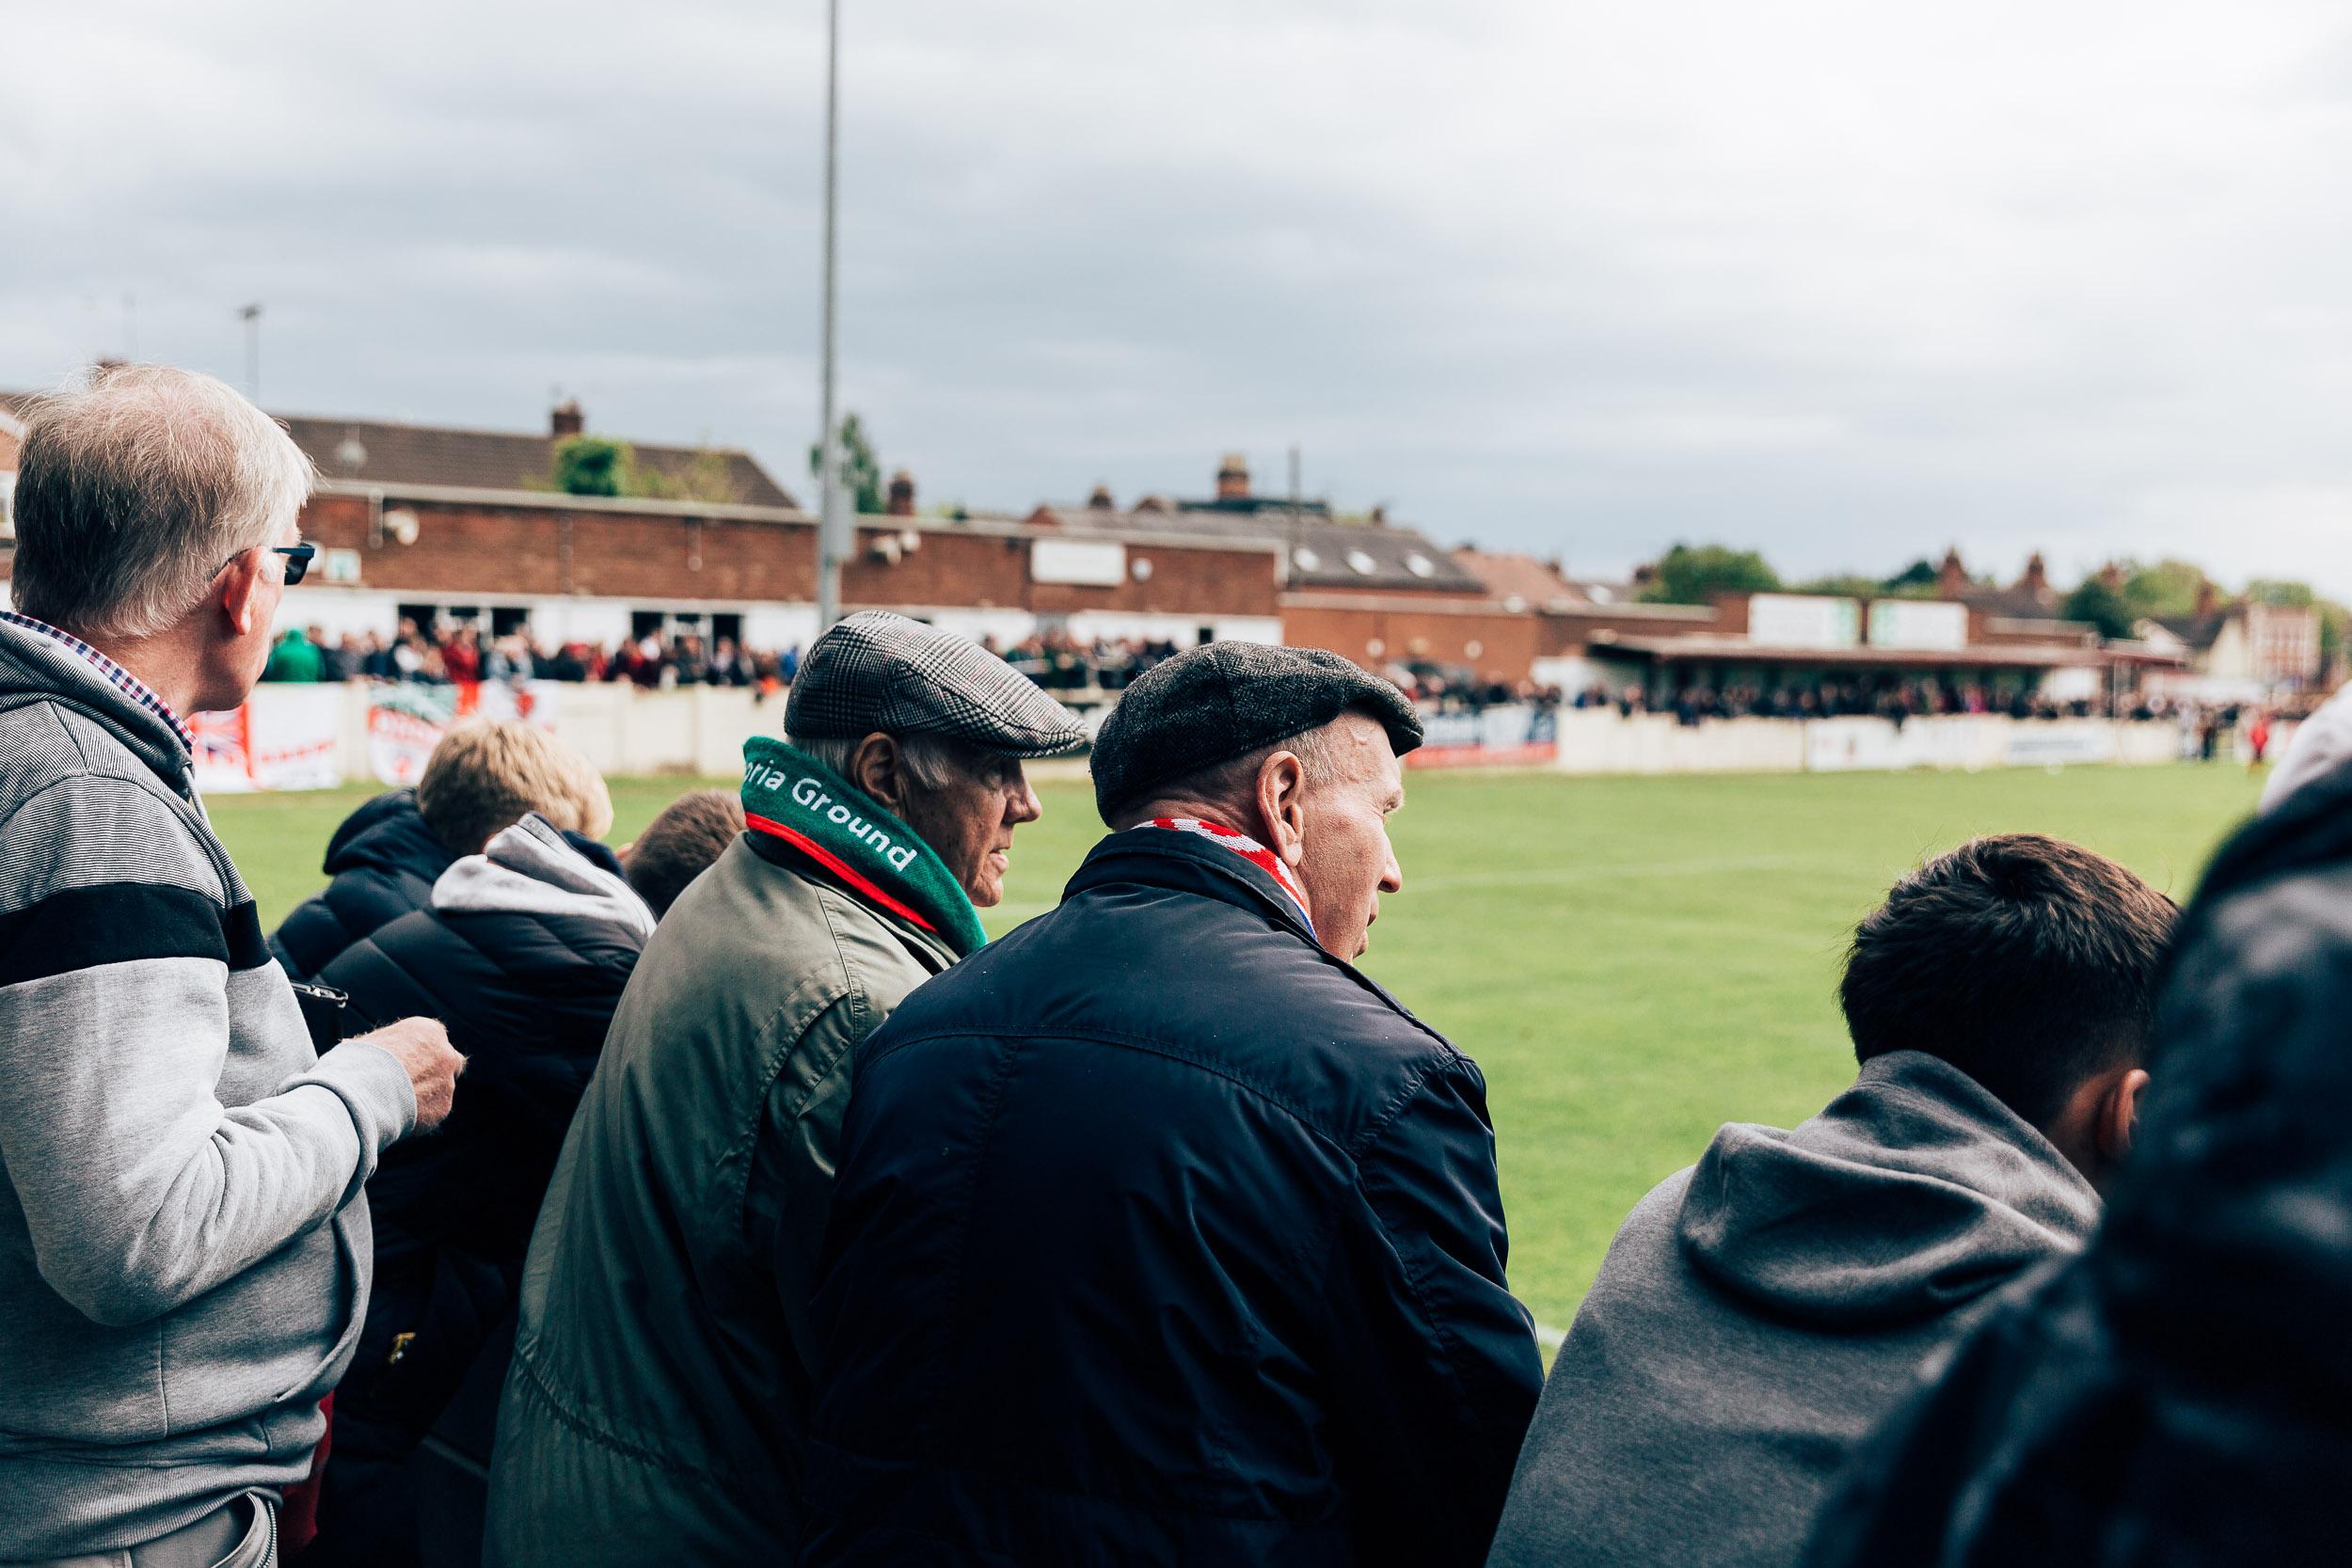 06_05_2019_Bromsgrove_Sporting_Corby-88.jpg